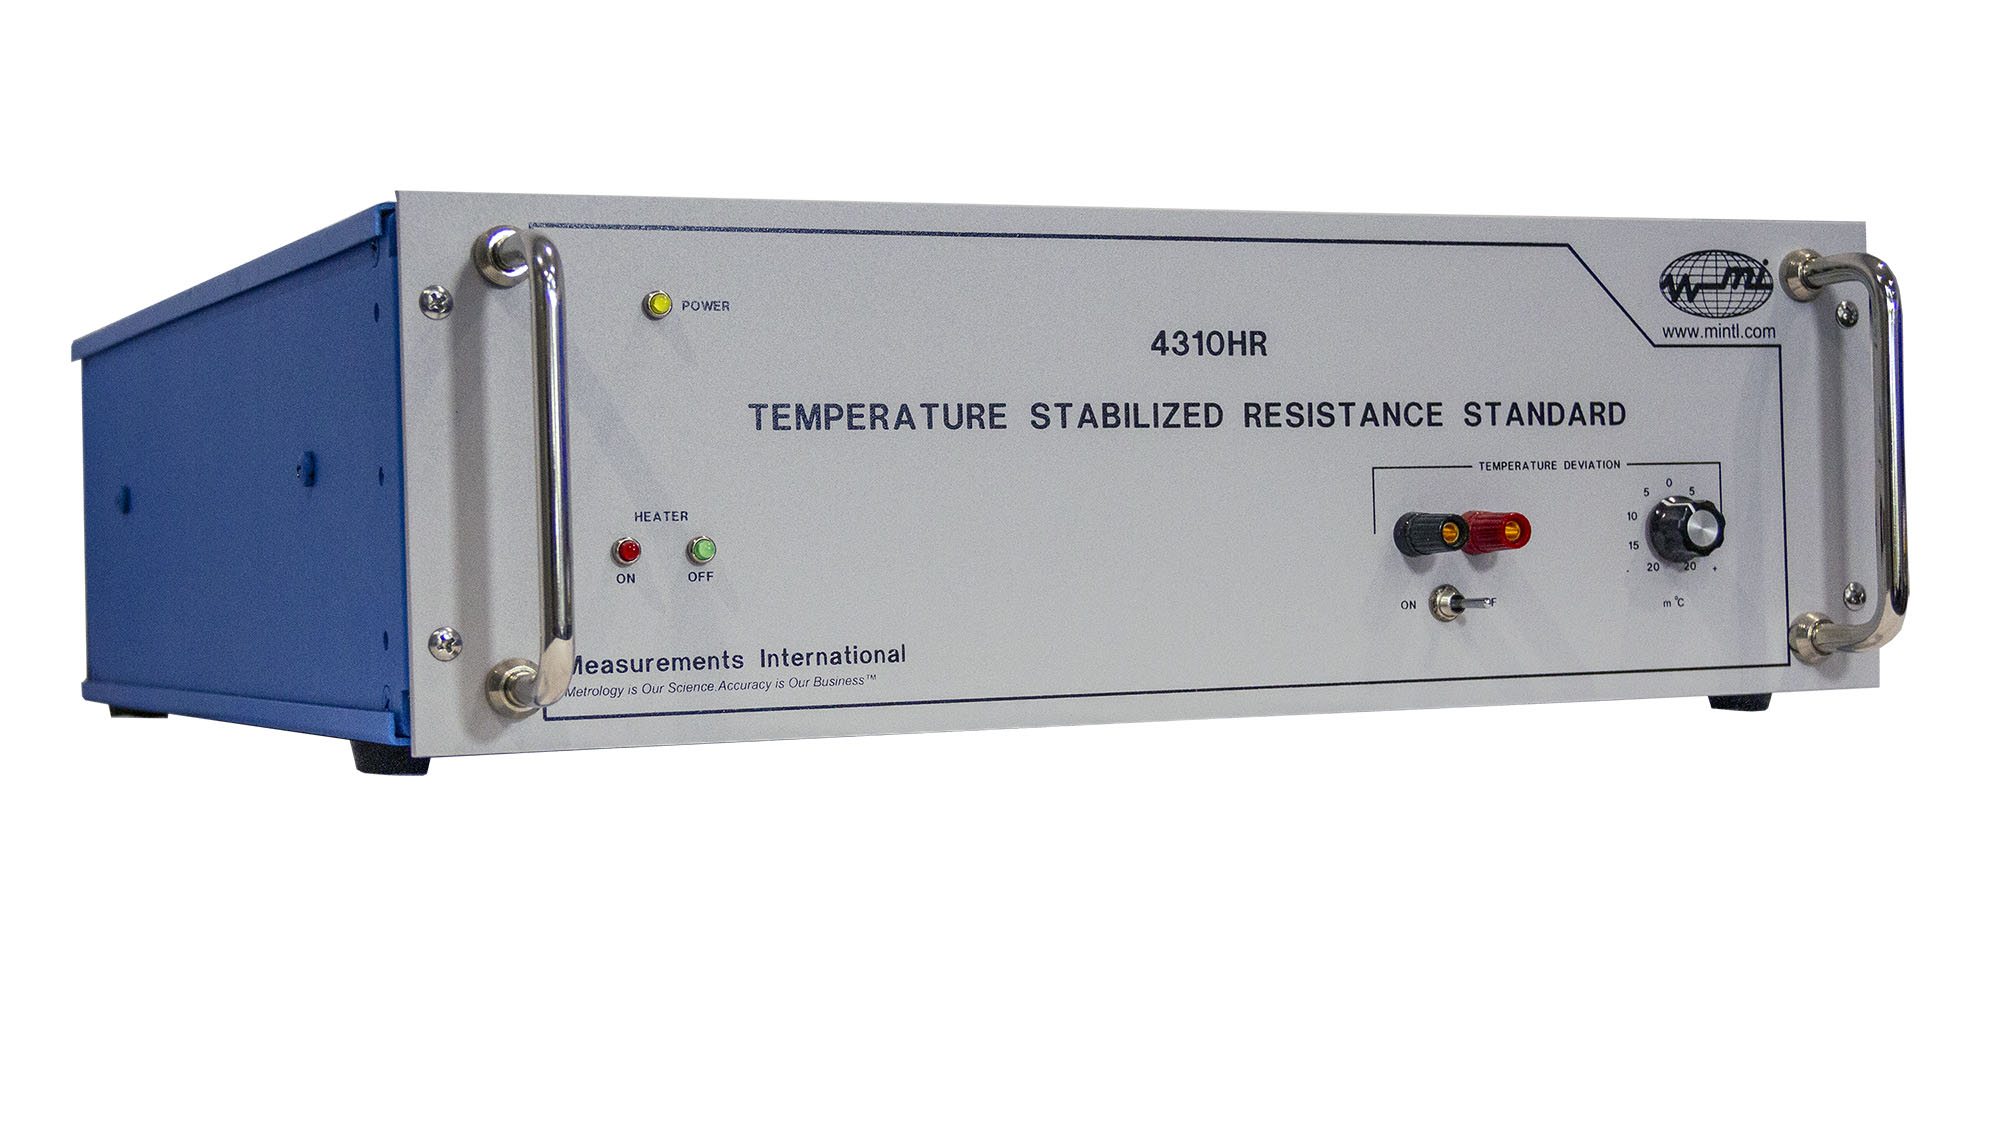 4310HR Temperature Stabilized Resistance Standard